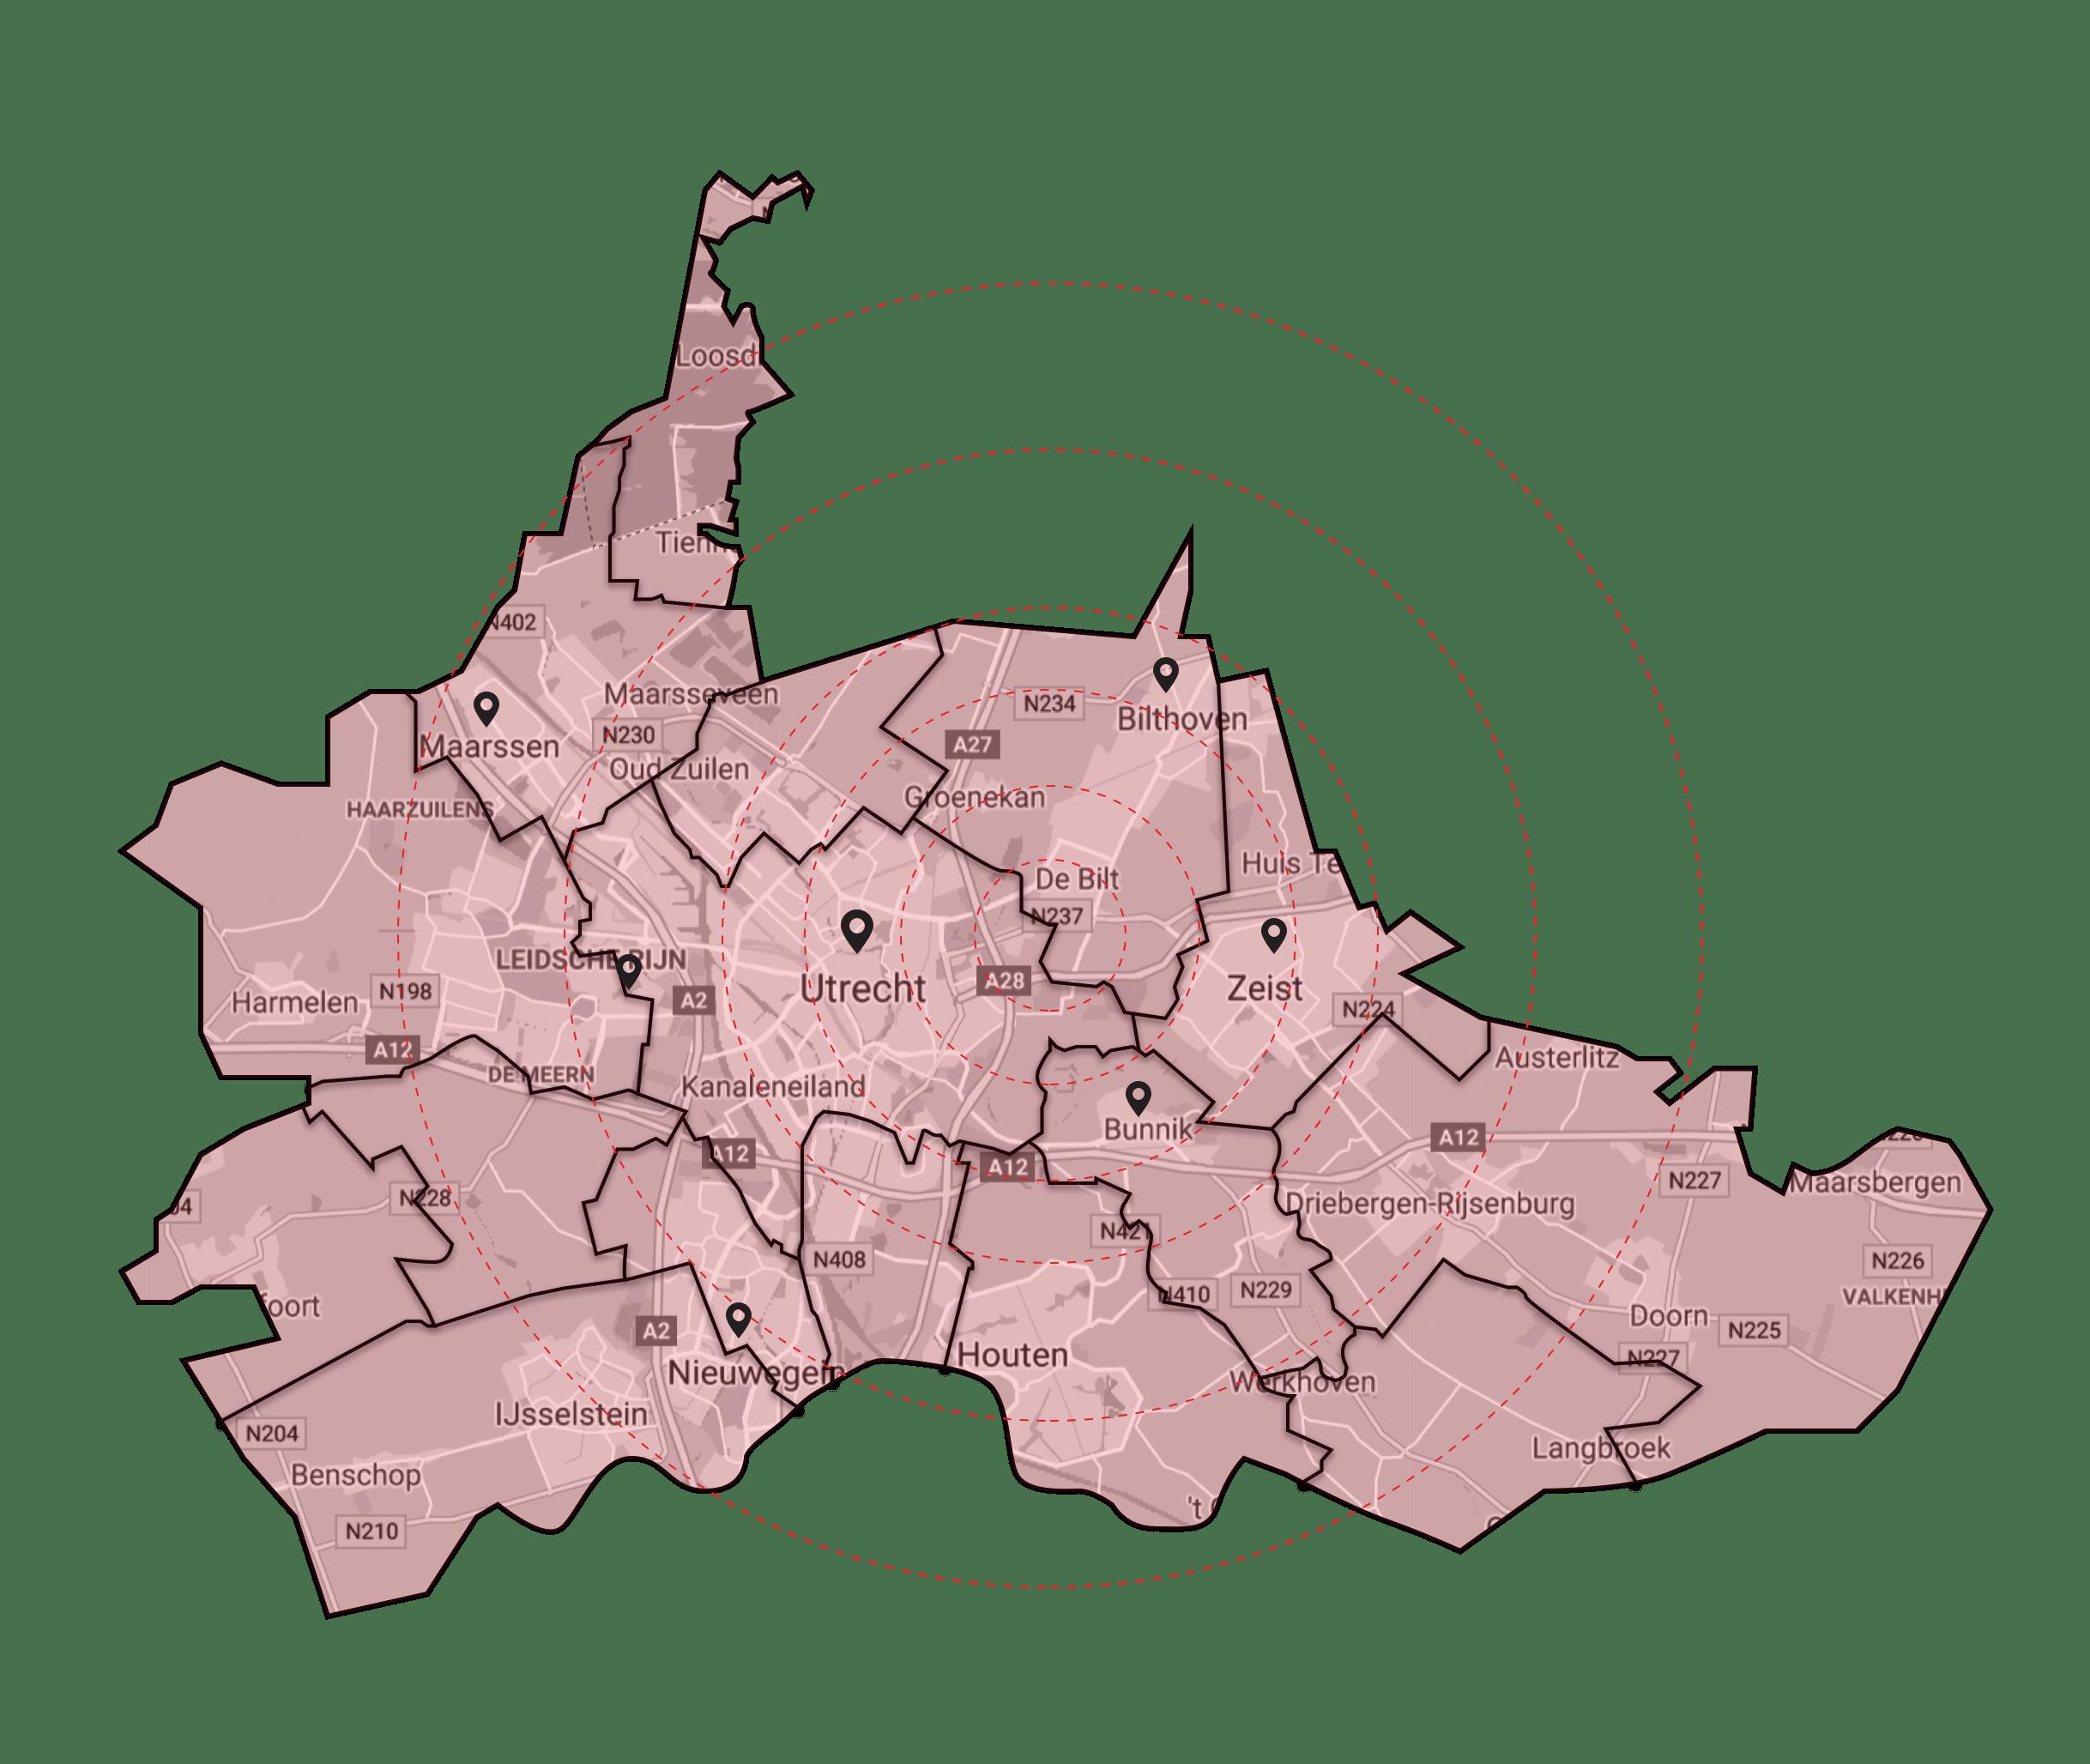 regio WSP amersfoort